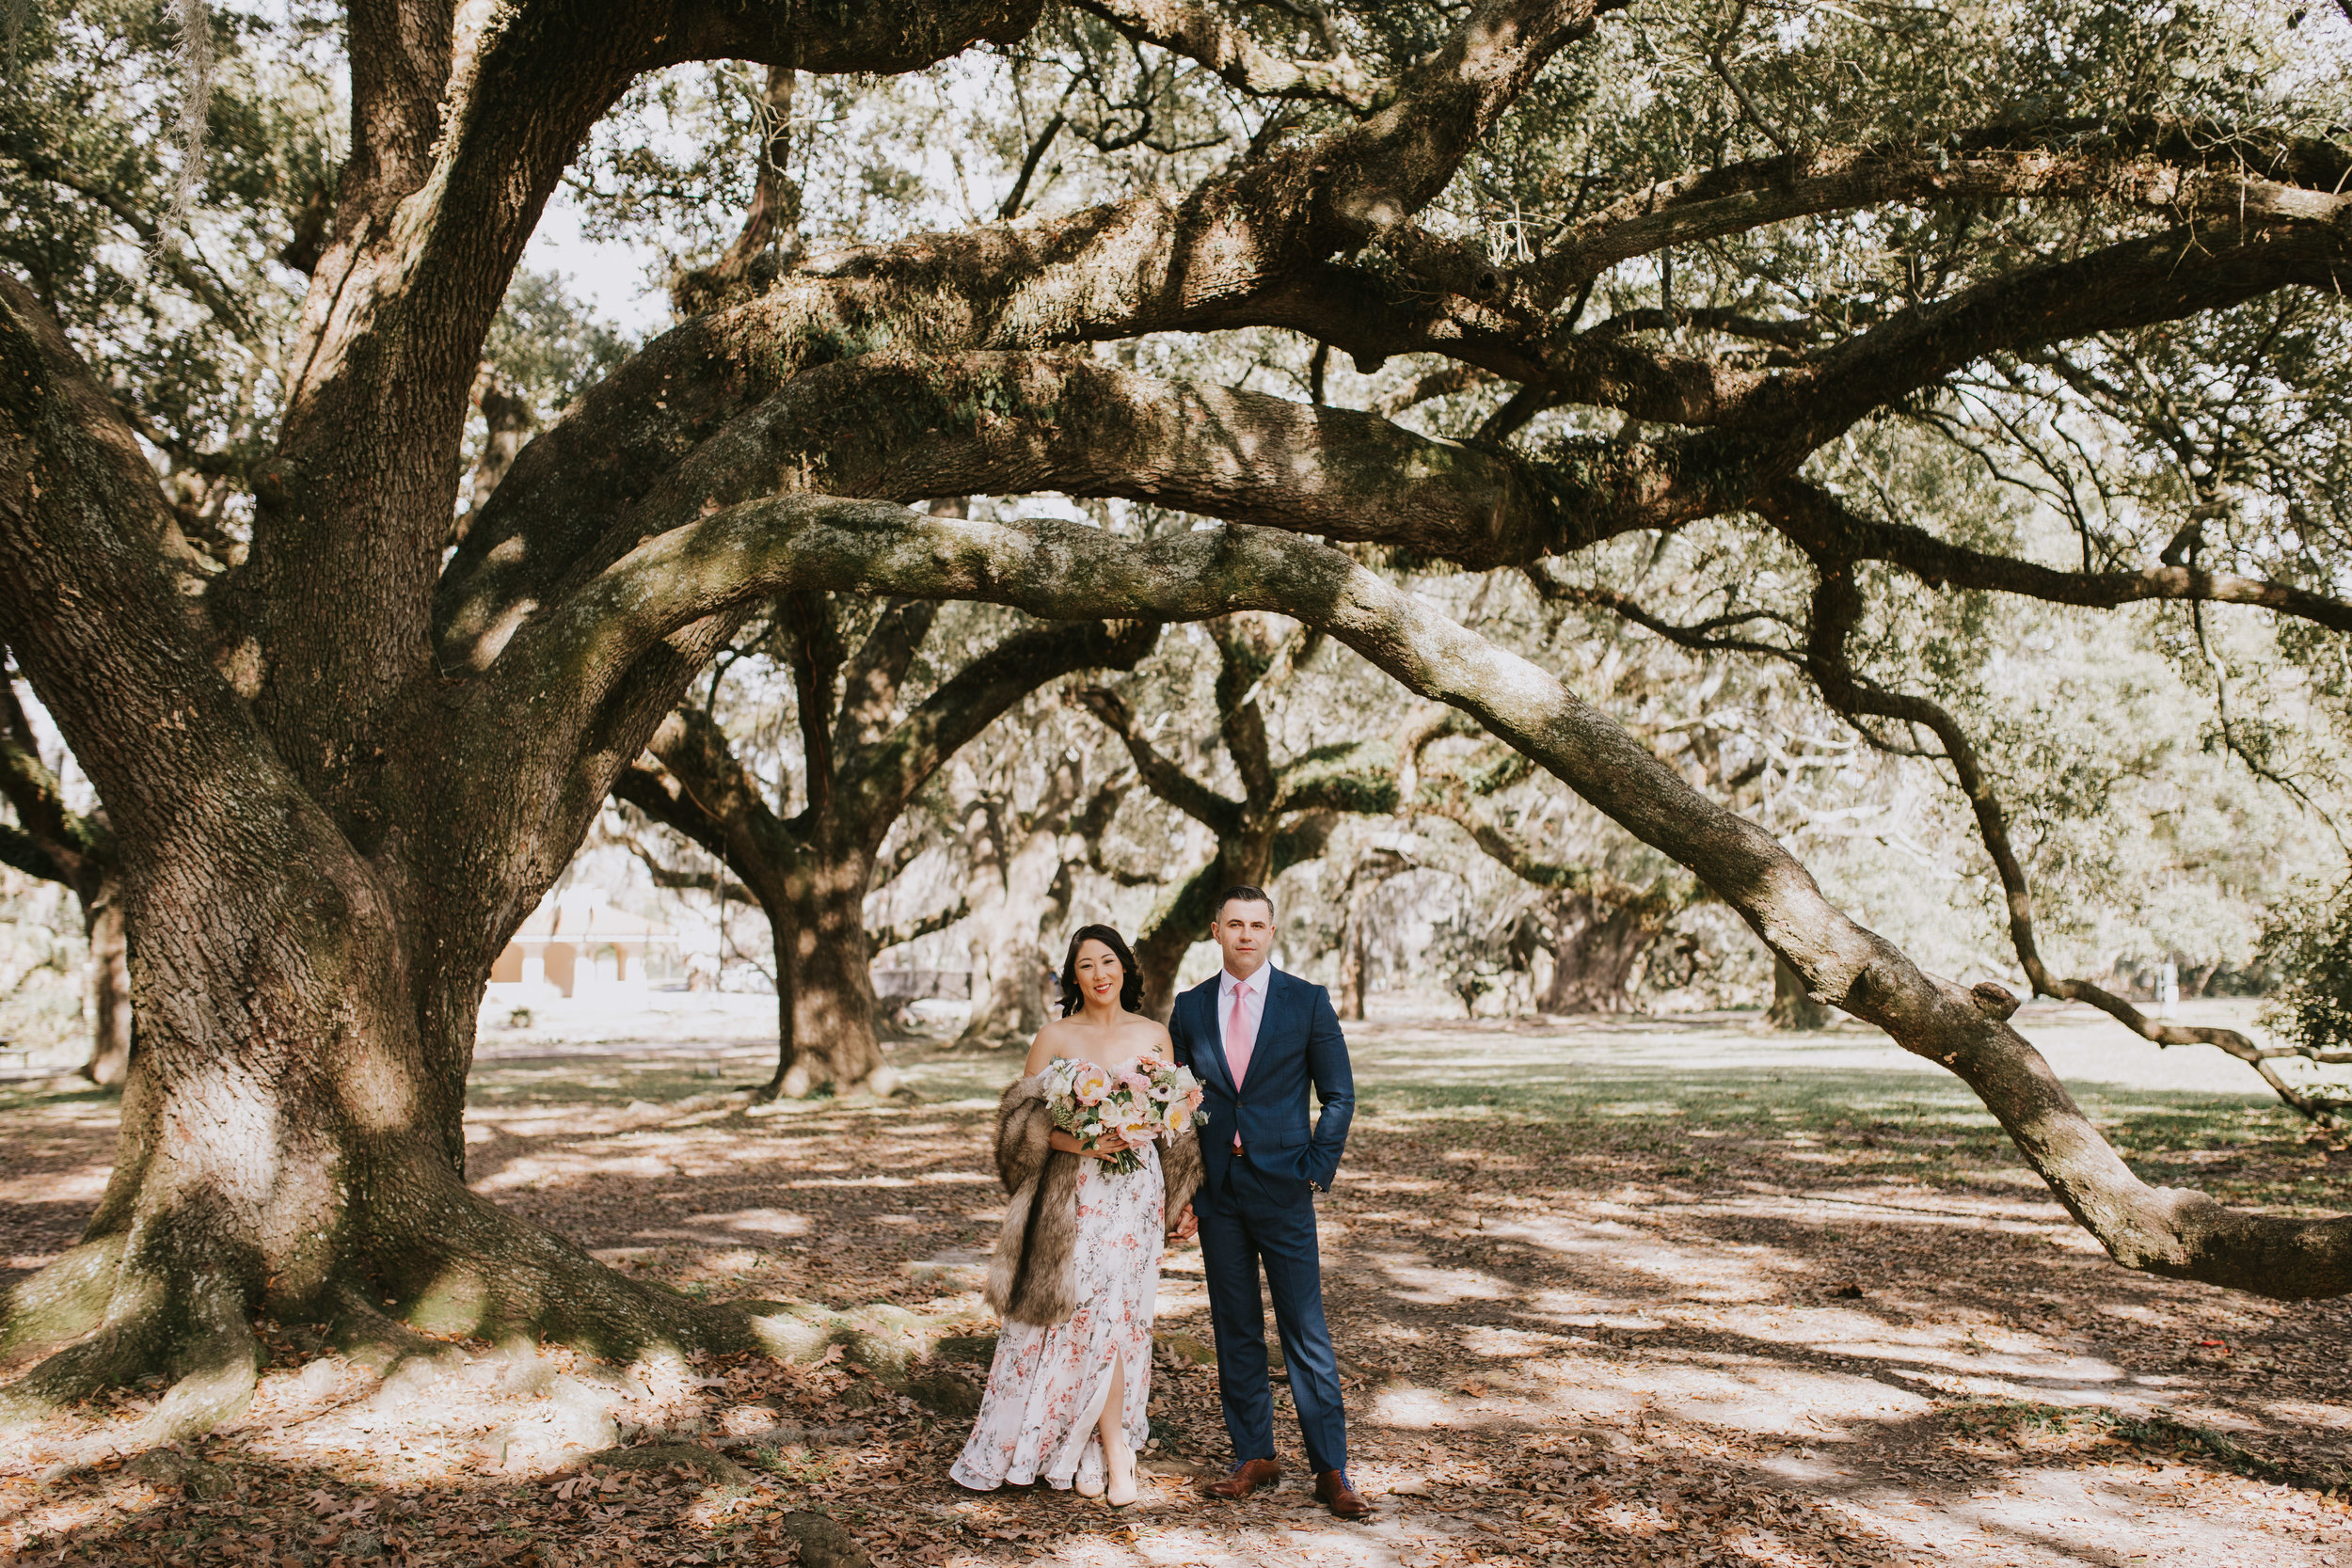 City Park Elopement New Orleans Wedding Photographer Ashley Biltz Photography16.jpg